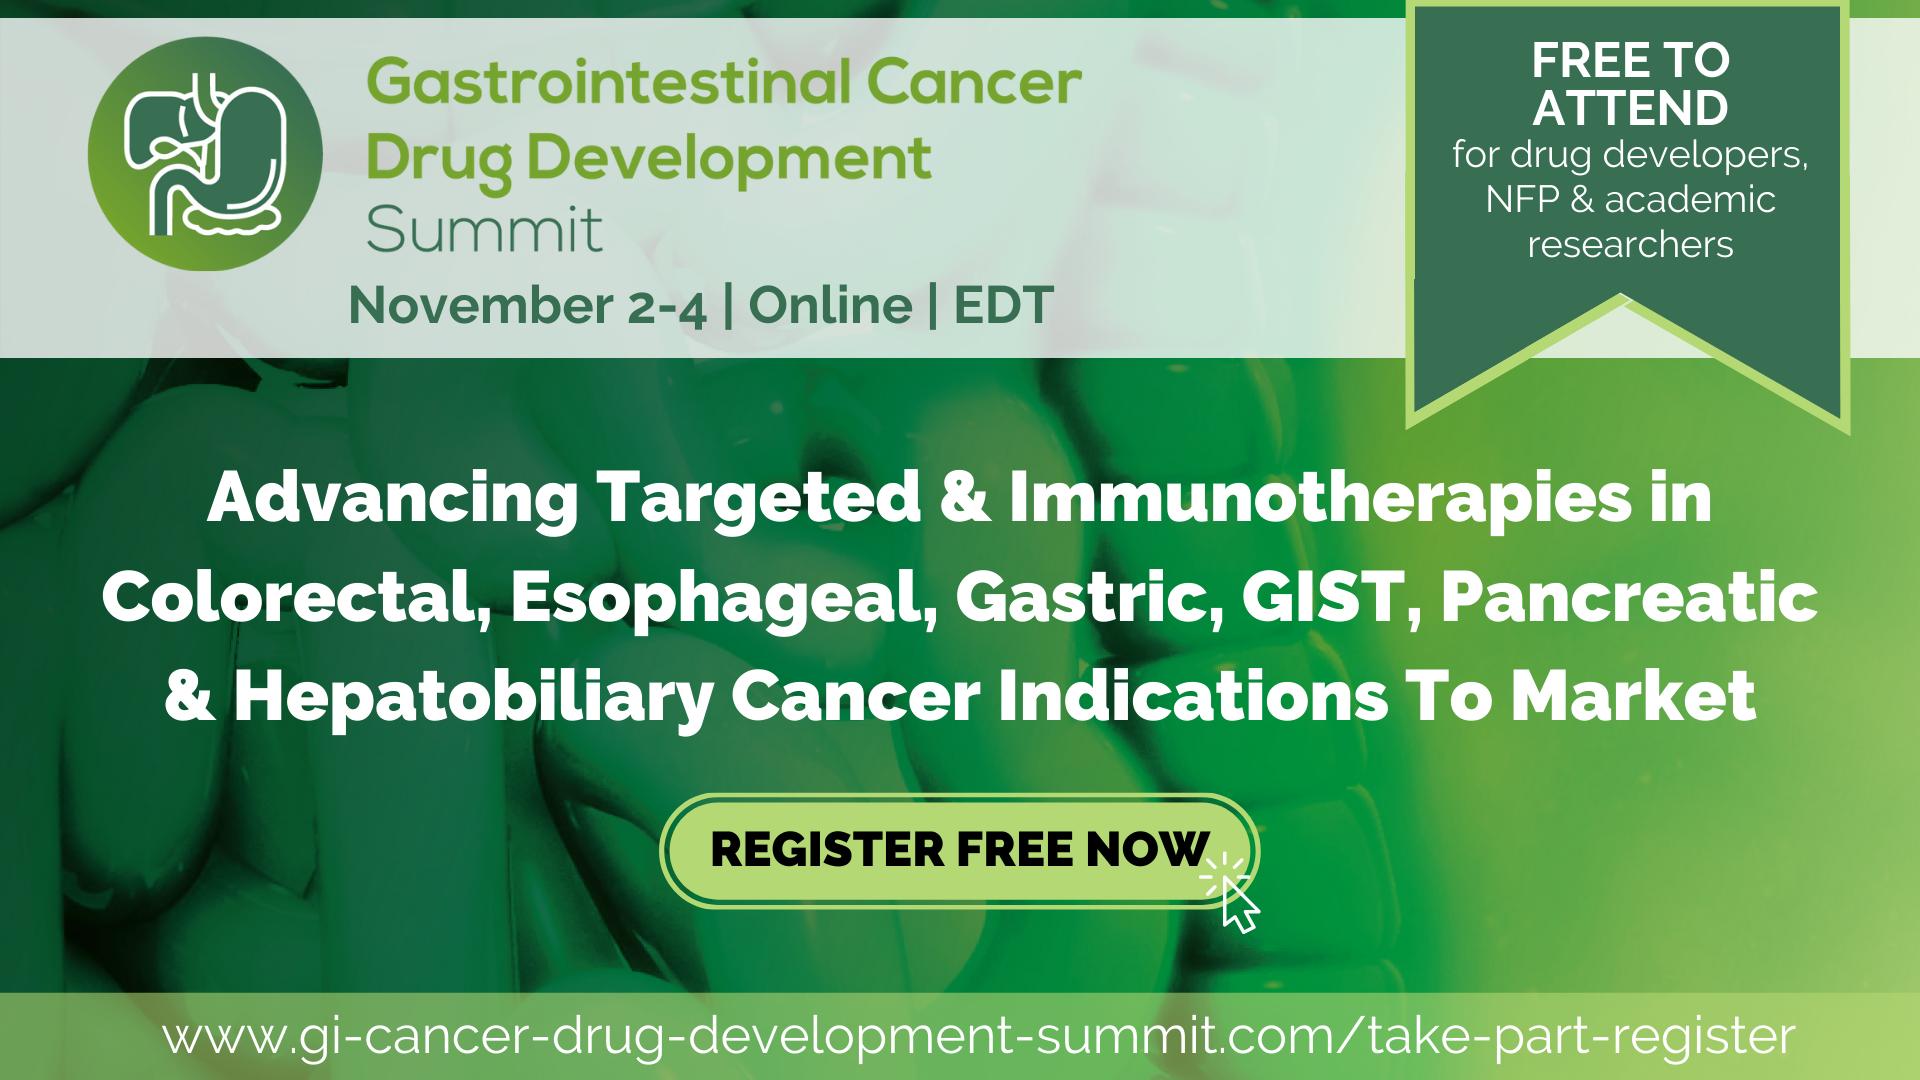 FREE – Gastrointestinal Cancer Drug Development Digital Summit